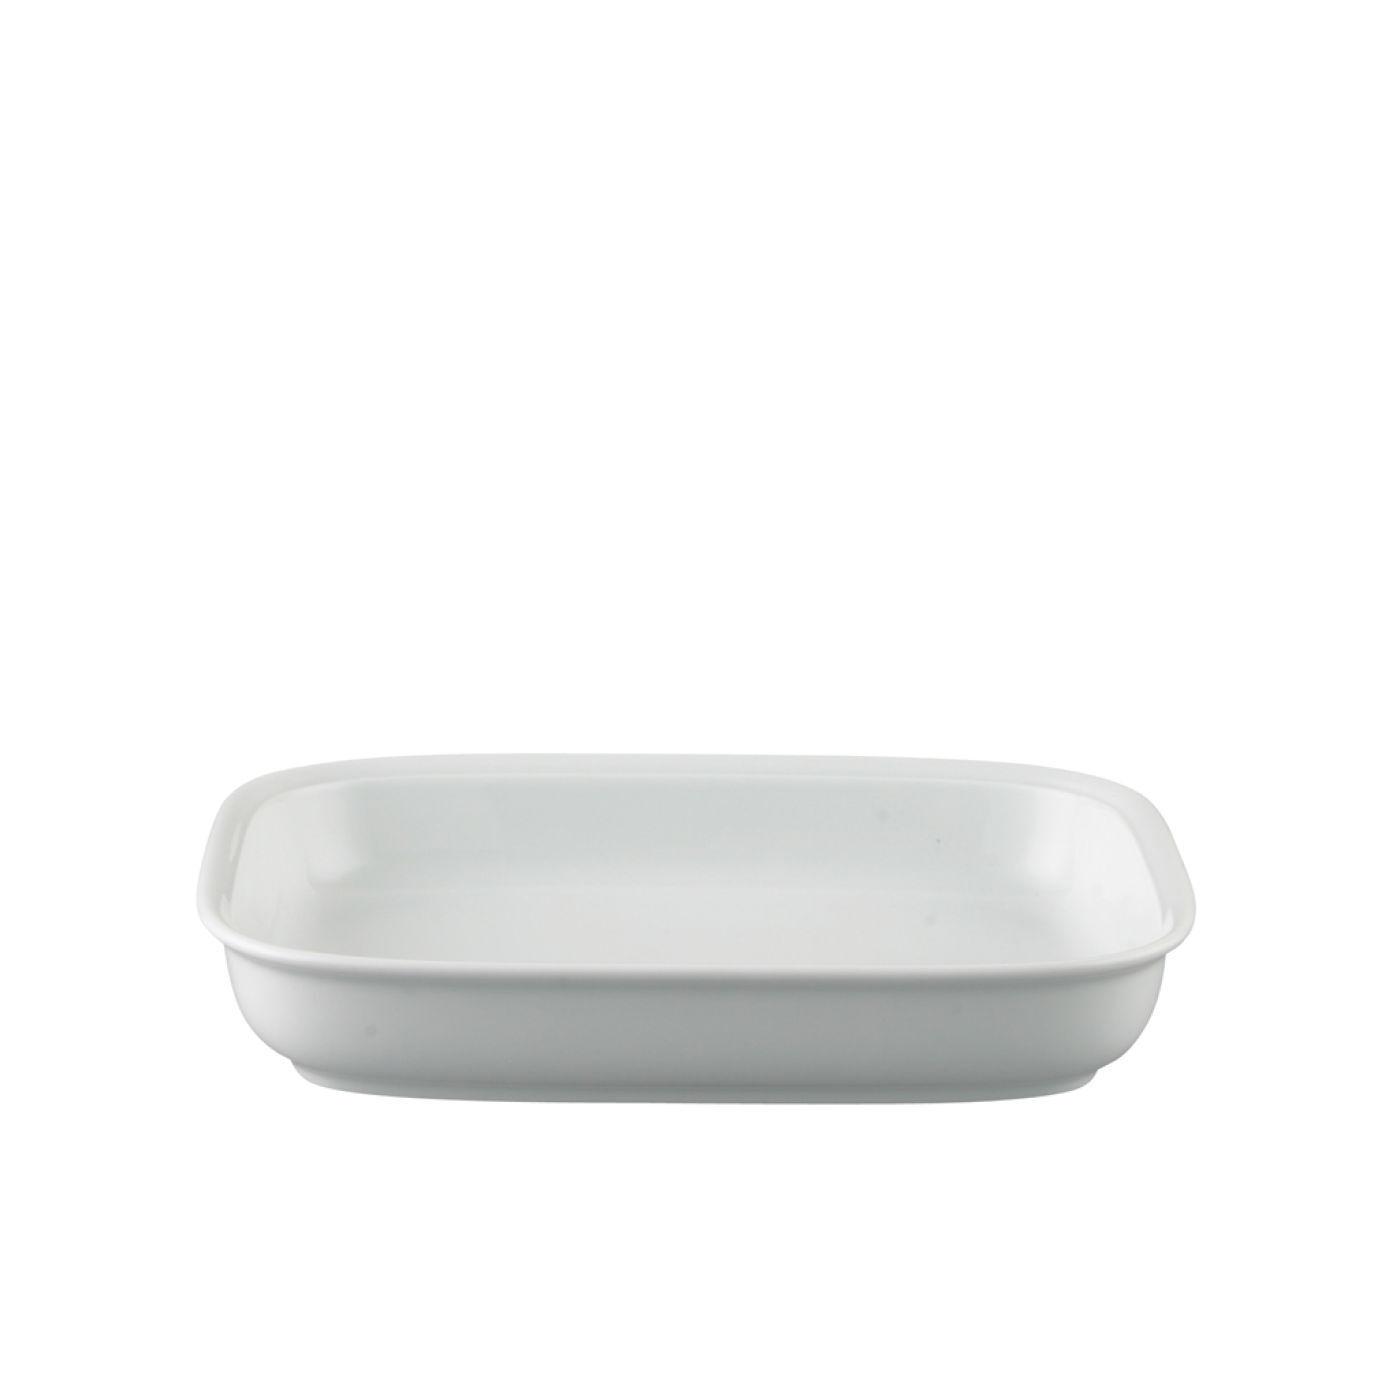 Lasaña 39 cm - 13559-Thomas tendencia blancoo-lasagneform tarta